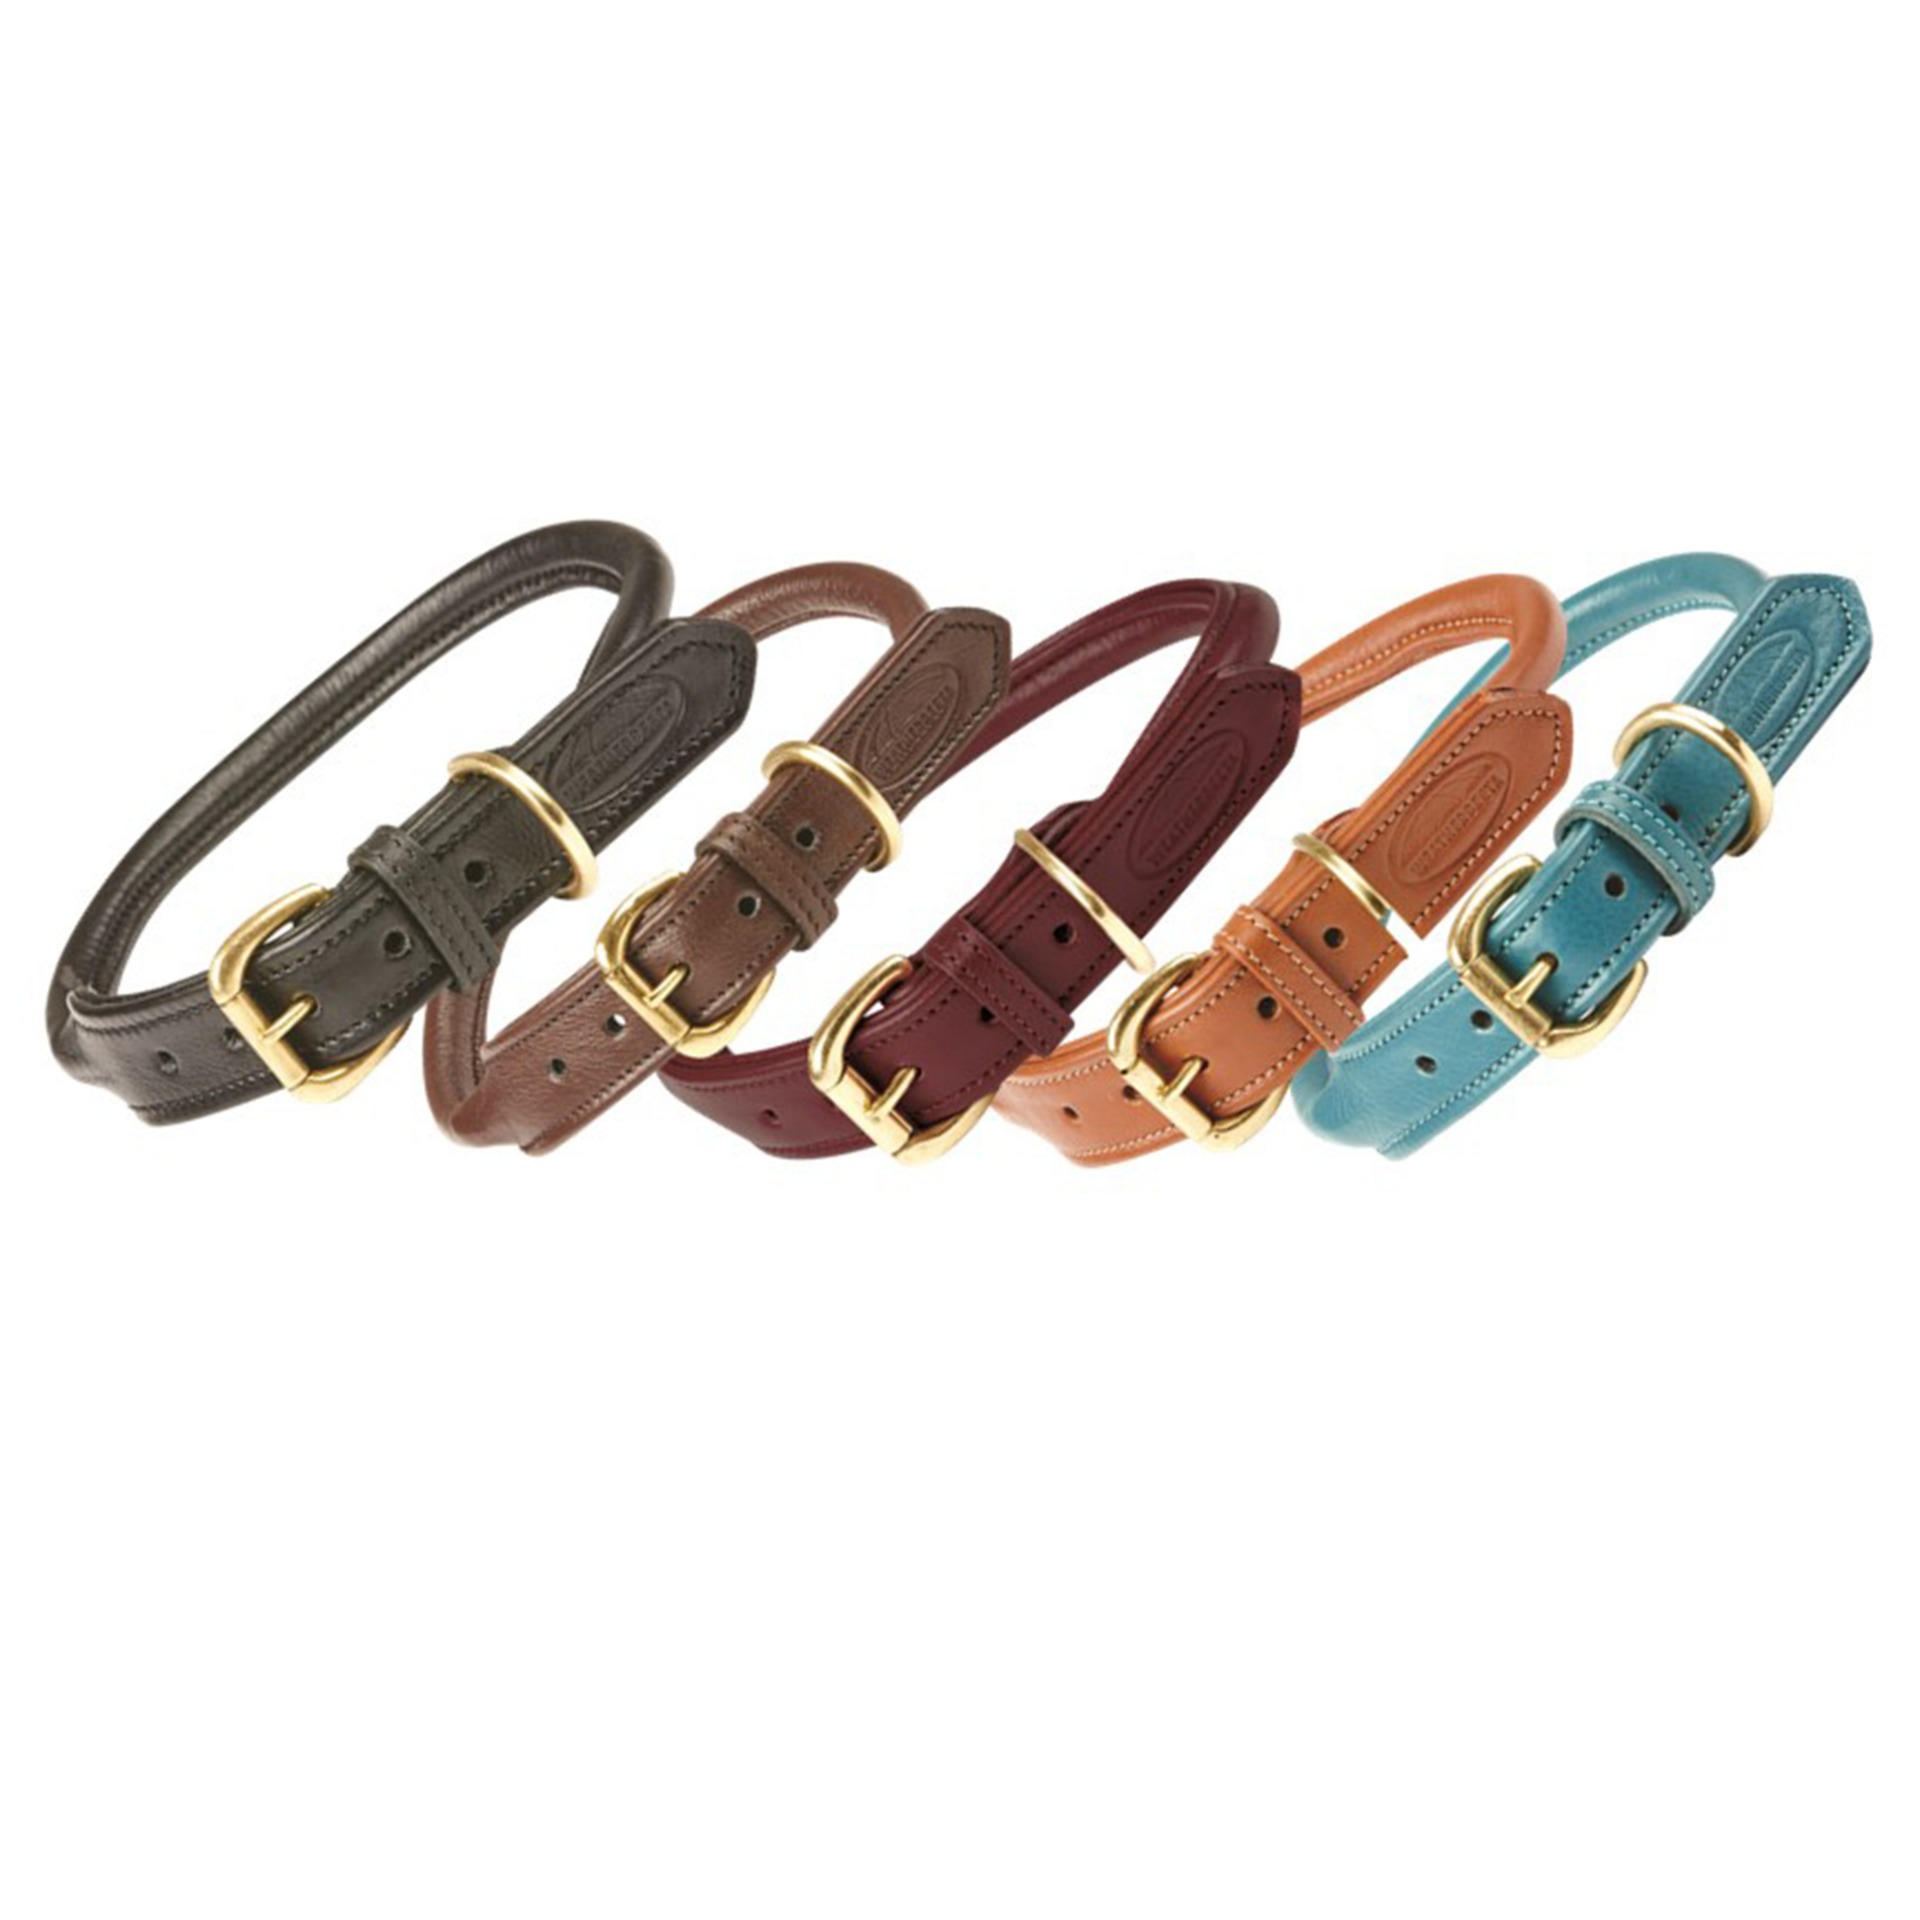 WeatherBeeta Rolled Leather Dog Collar Size Chart